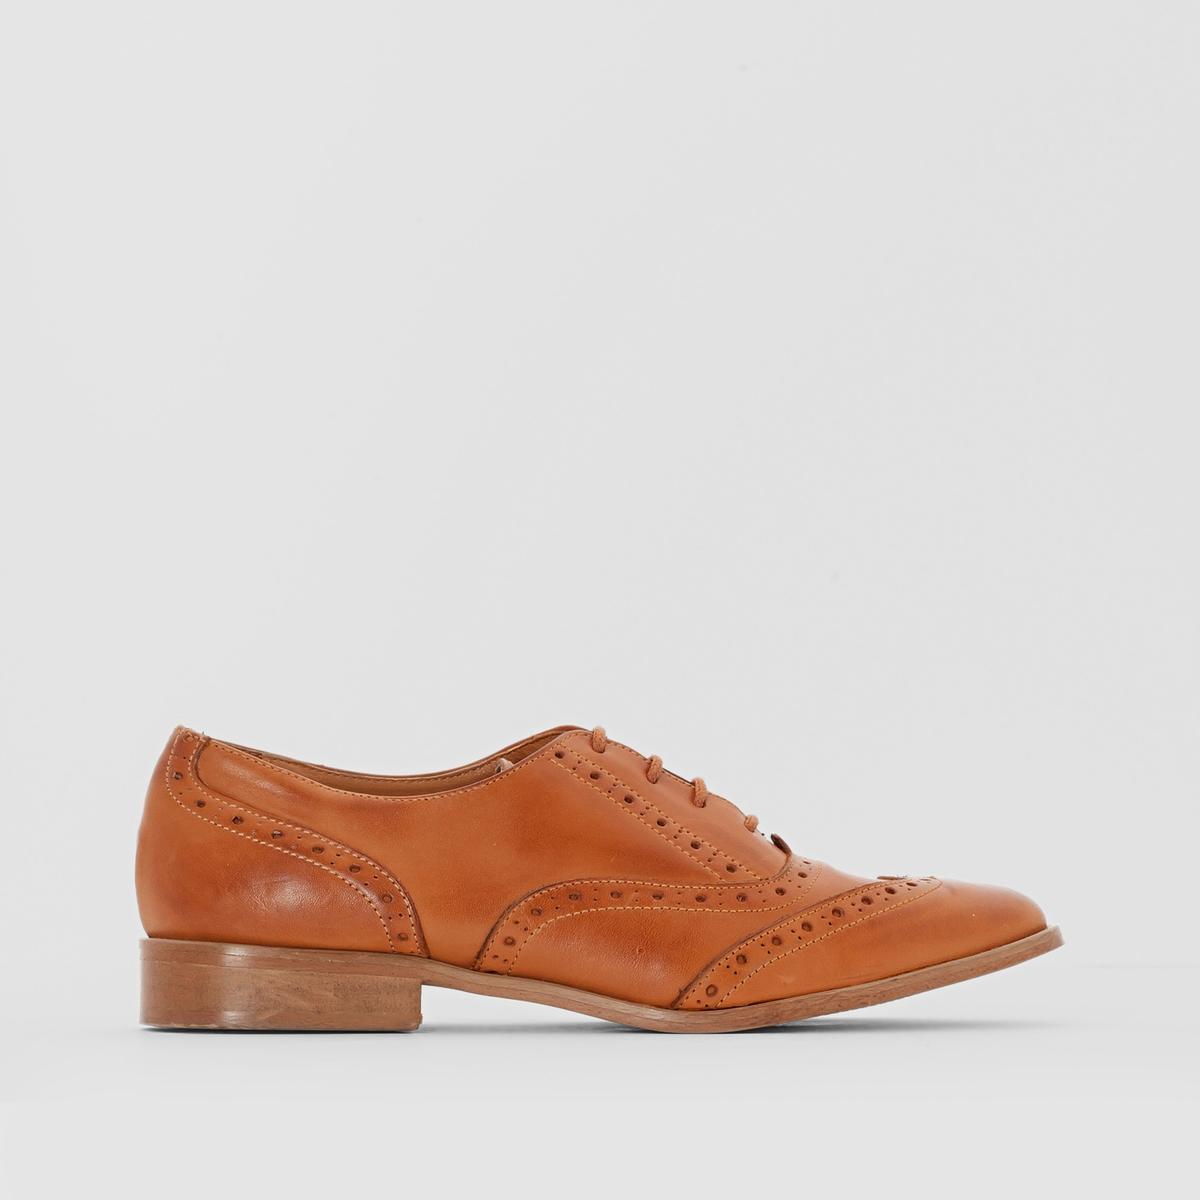 Туфли-дерби из кожи на шнуровке от ANNE WEYBURN